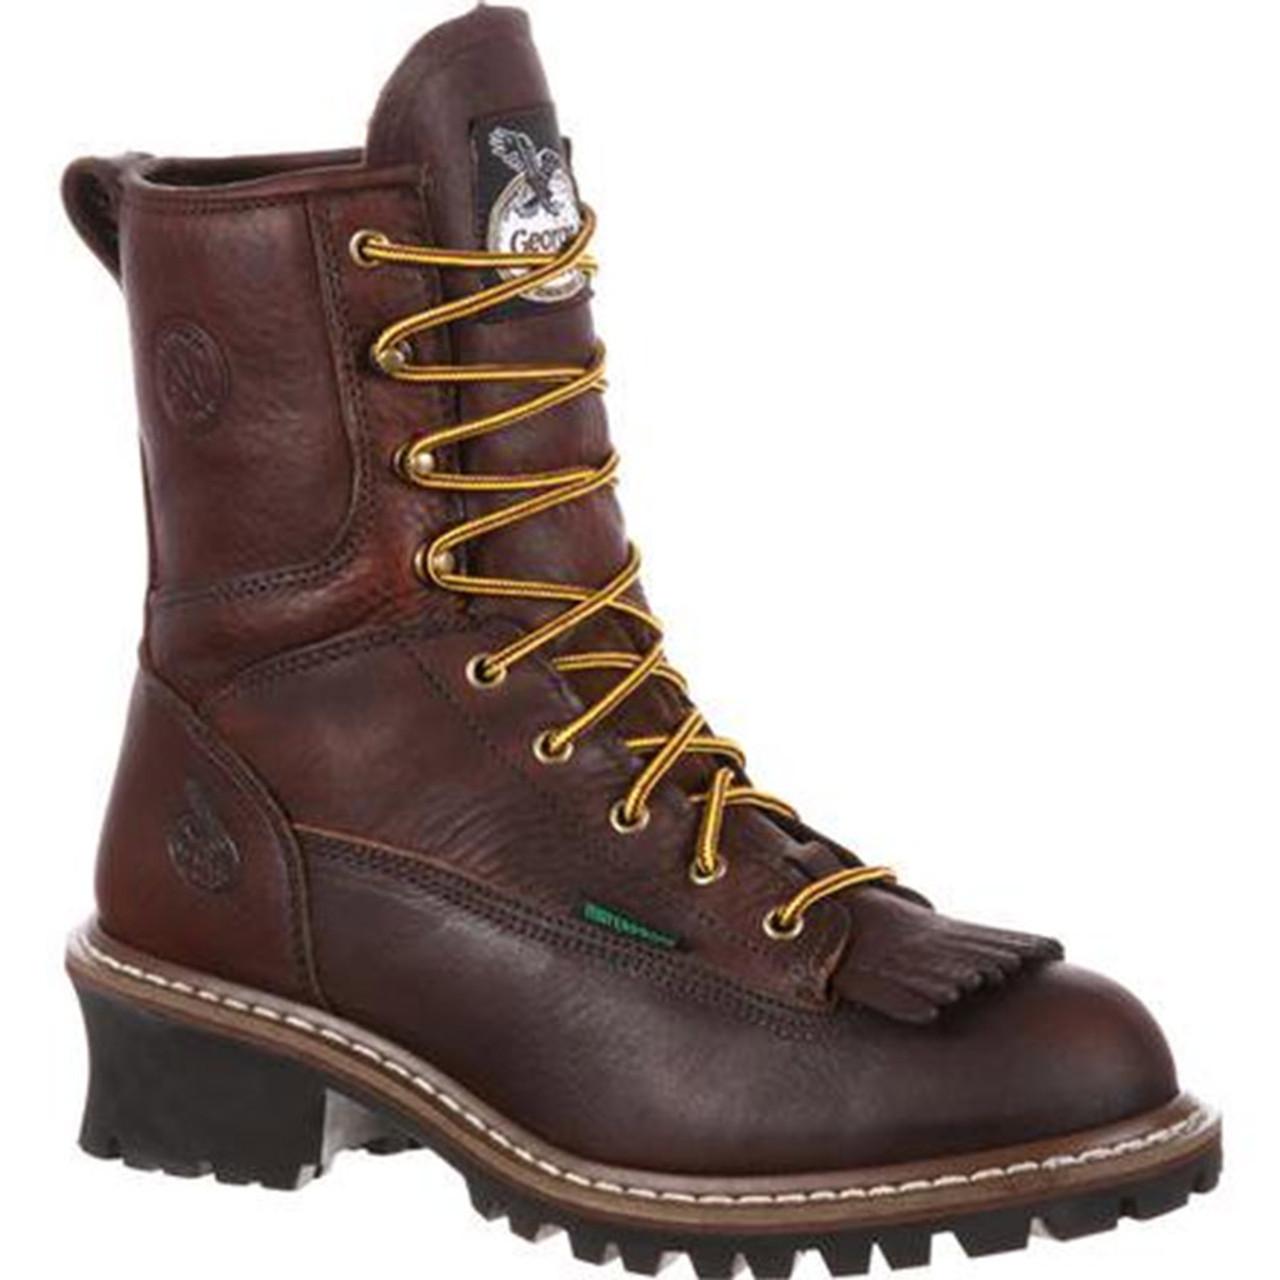 Georgia Boot G7313 Steel Toe Non